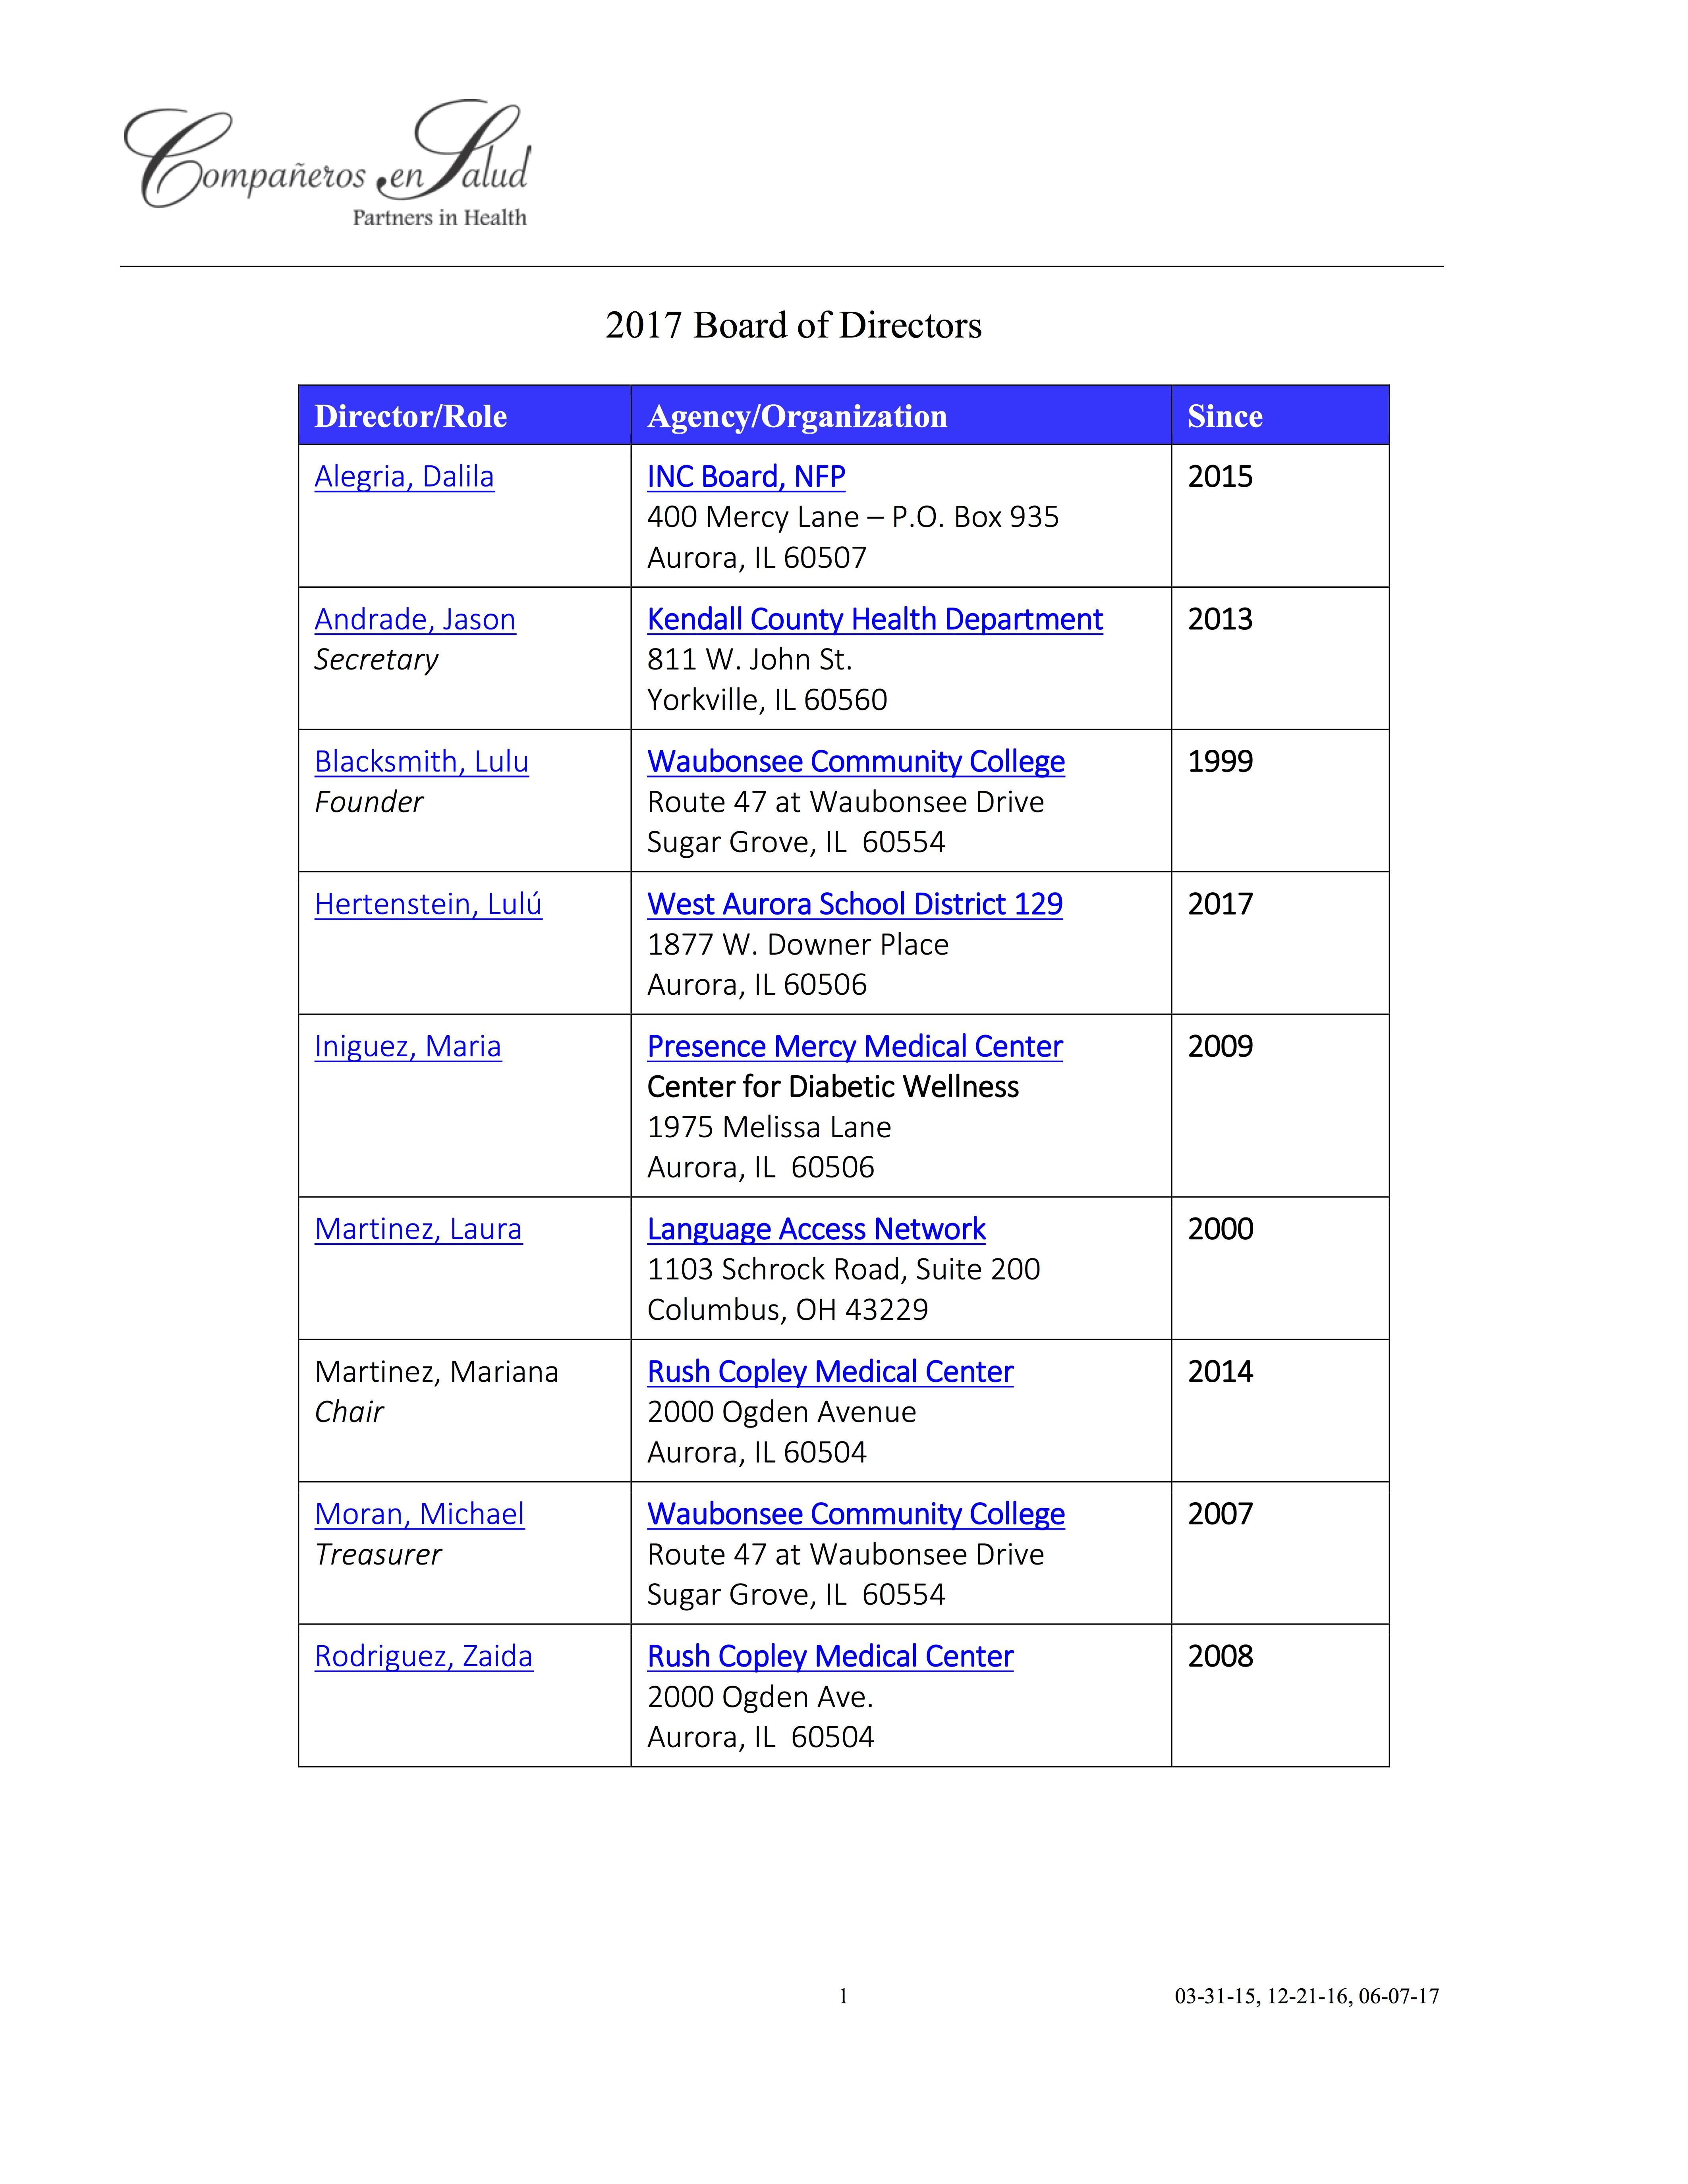 2017 Board of Directors - Terms